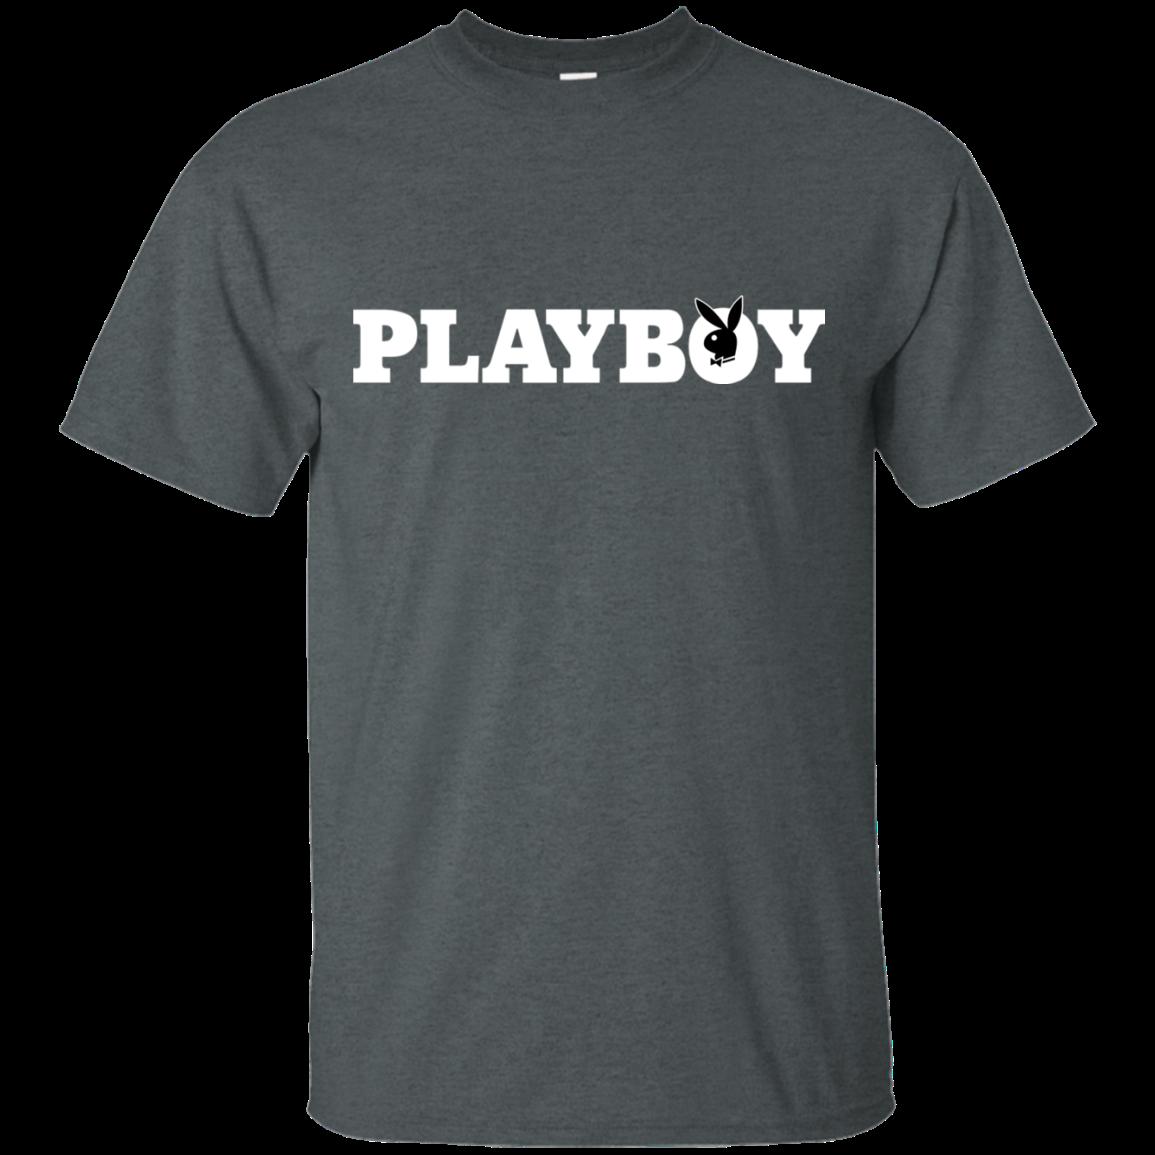 Hugh Hefner T Shirts Playboy Hoodies Sweatshirts Clothing